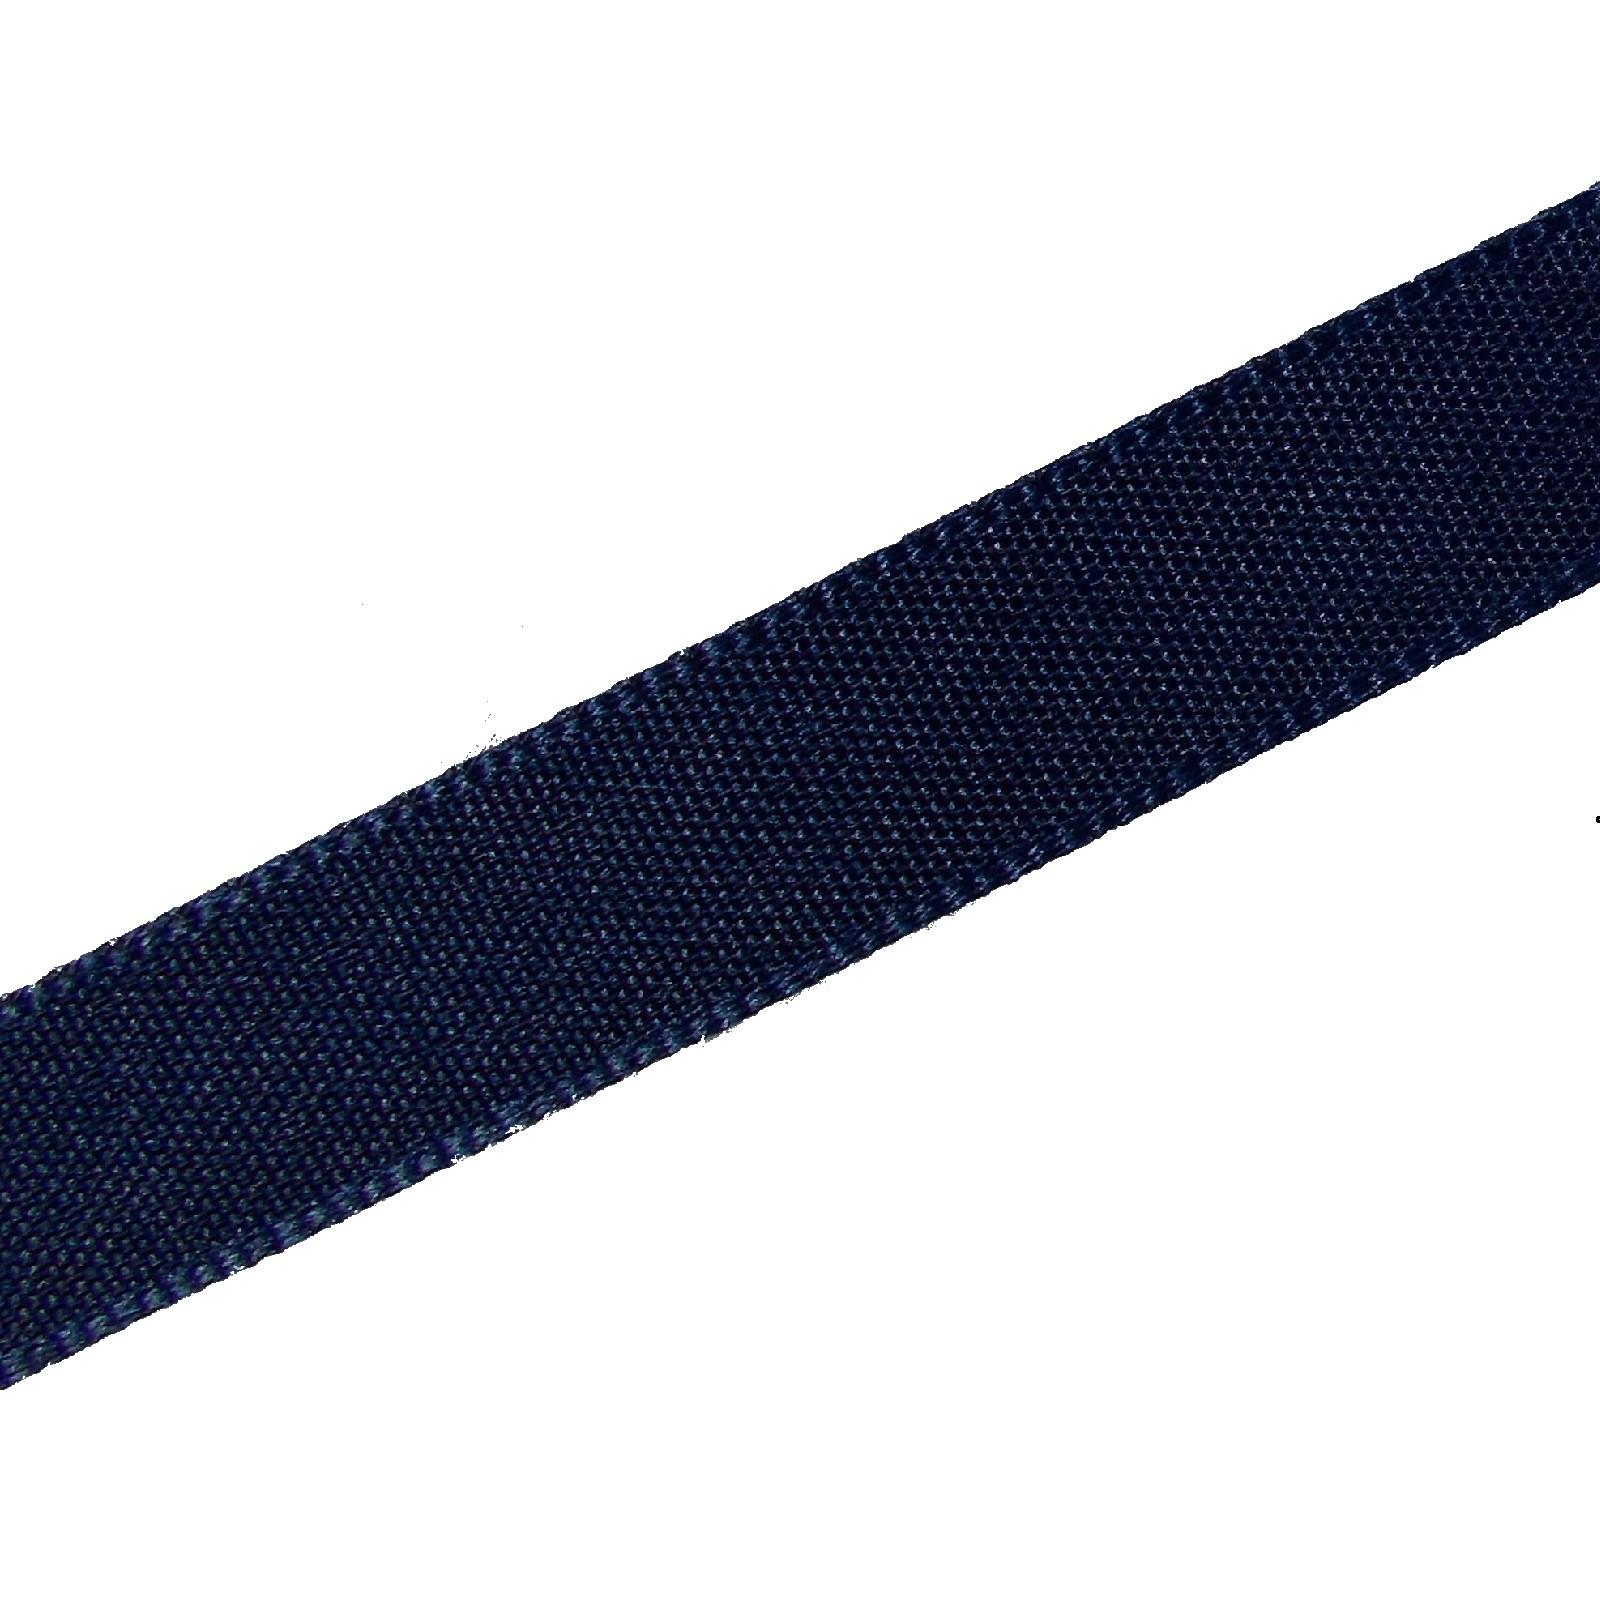 Berisfords Seam Binding Polyester Ribbon Tape 12mm wide Navy Blue 1 metre length